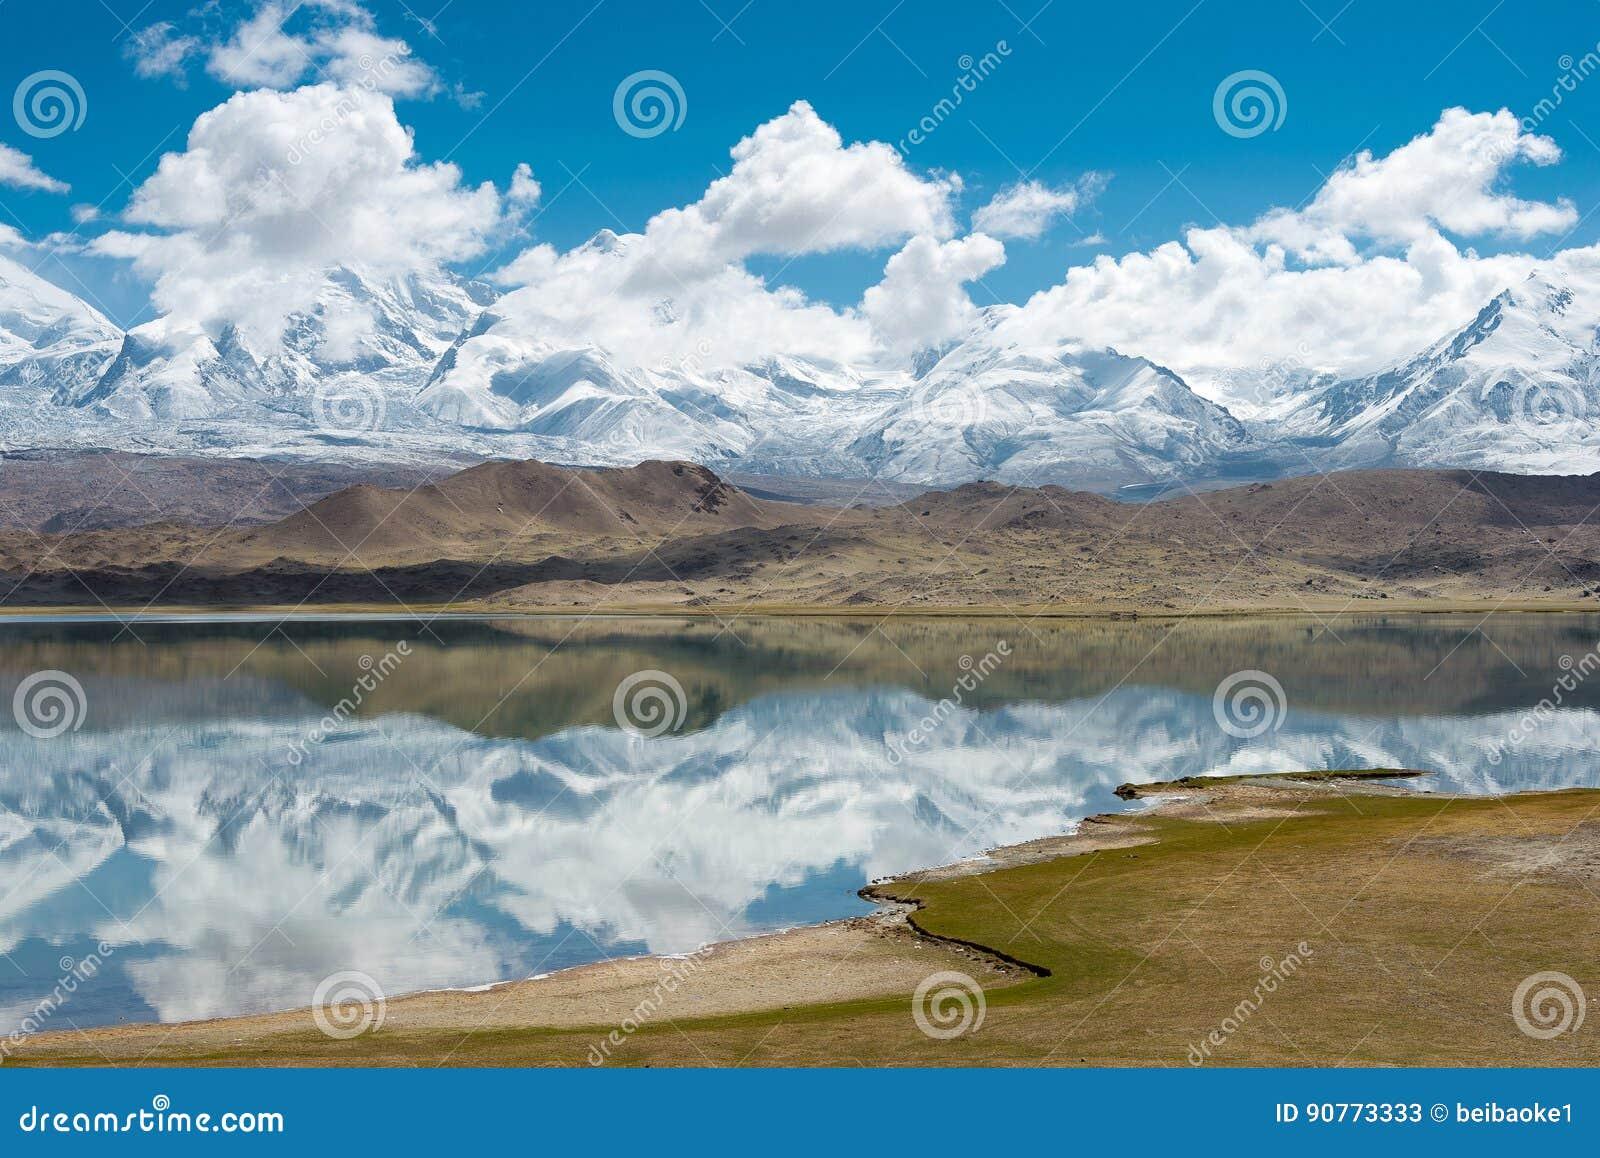 XINJIANG, CHINA - Mei 21 2015: Karakul Meer een beroemd landschap